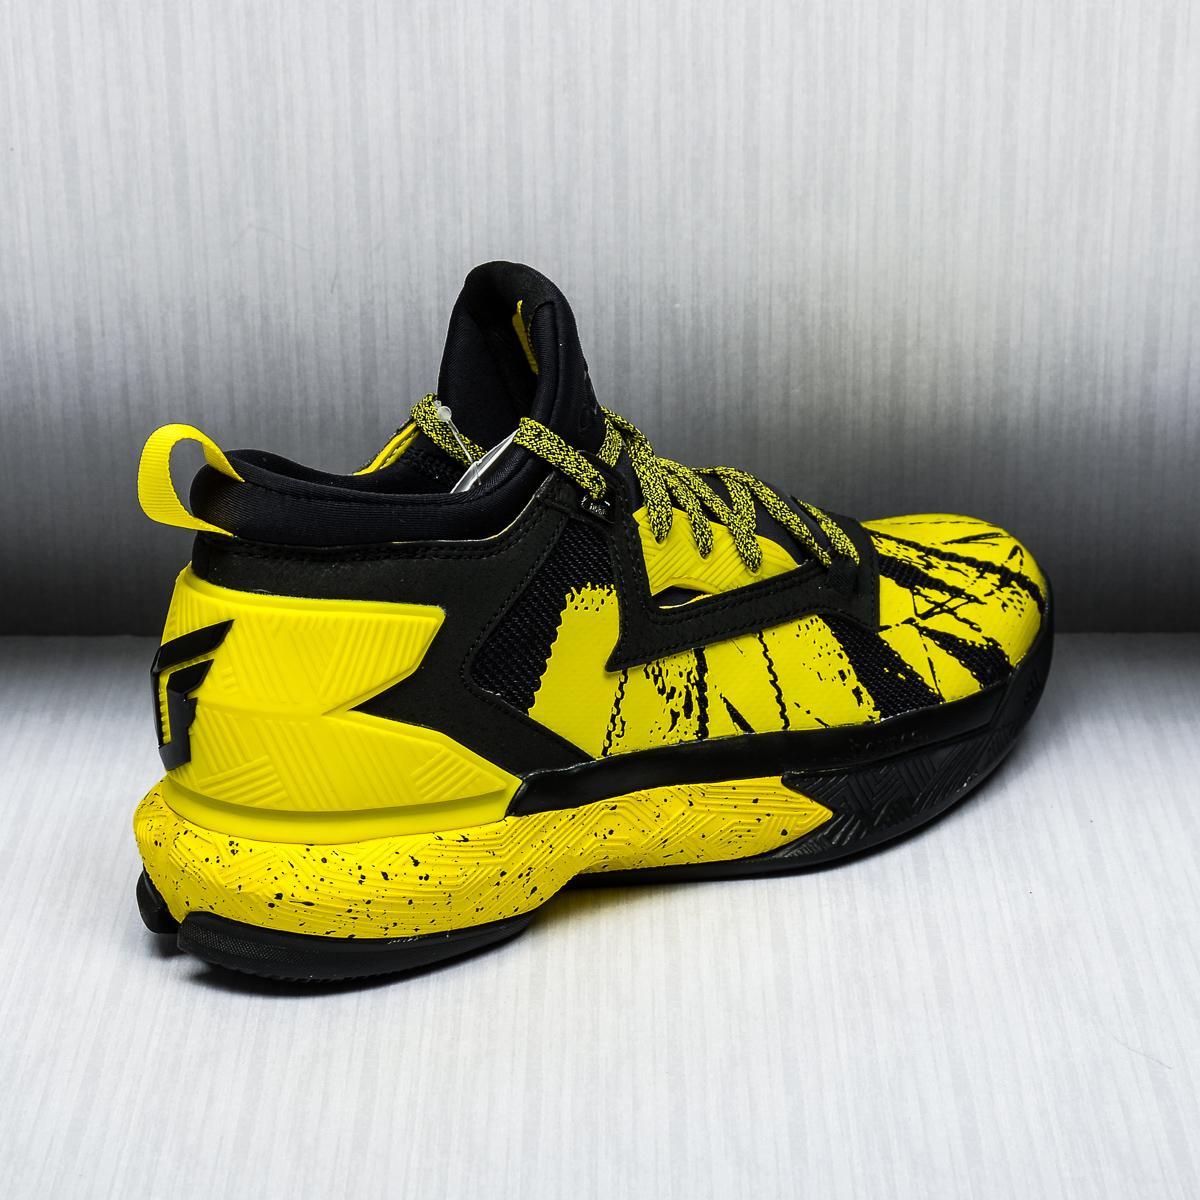 adidas yellow basketball shoes 43748786e